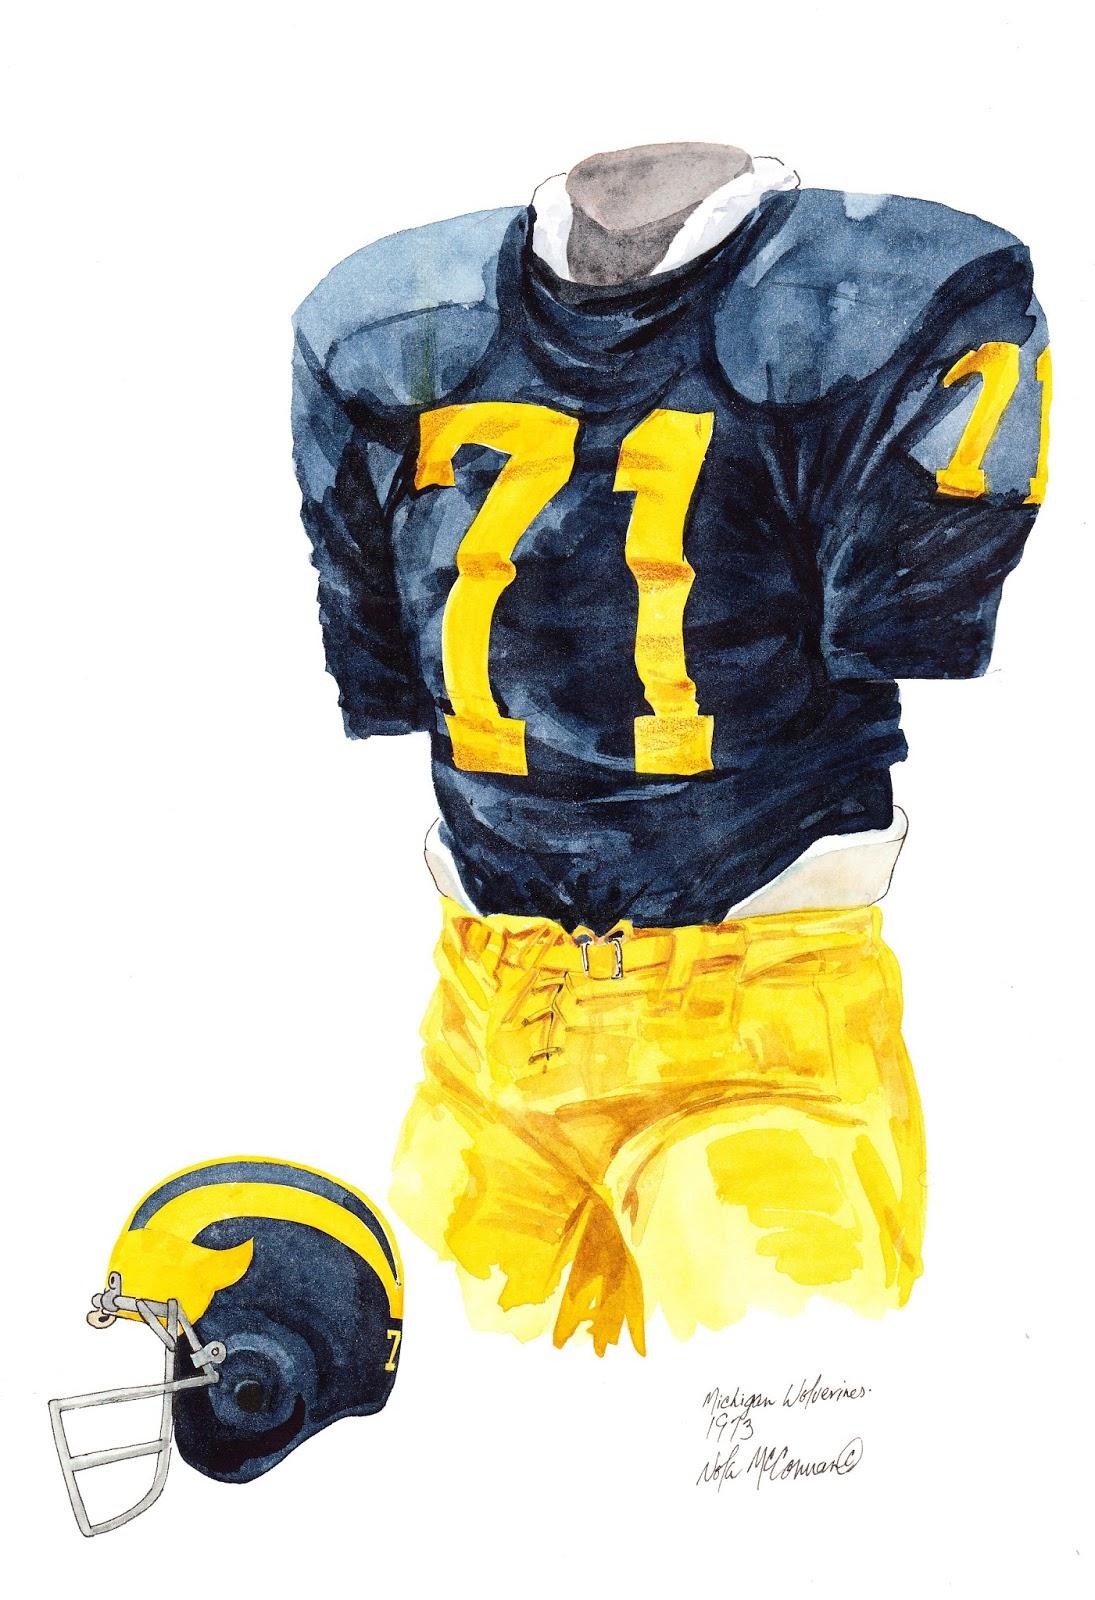 University Of Michigan Football Uniform And Team History